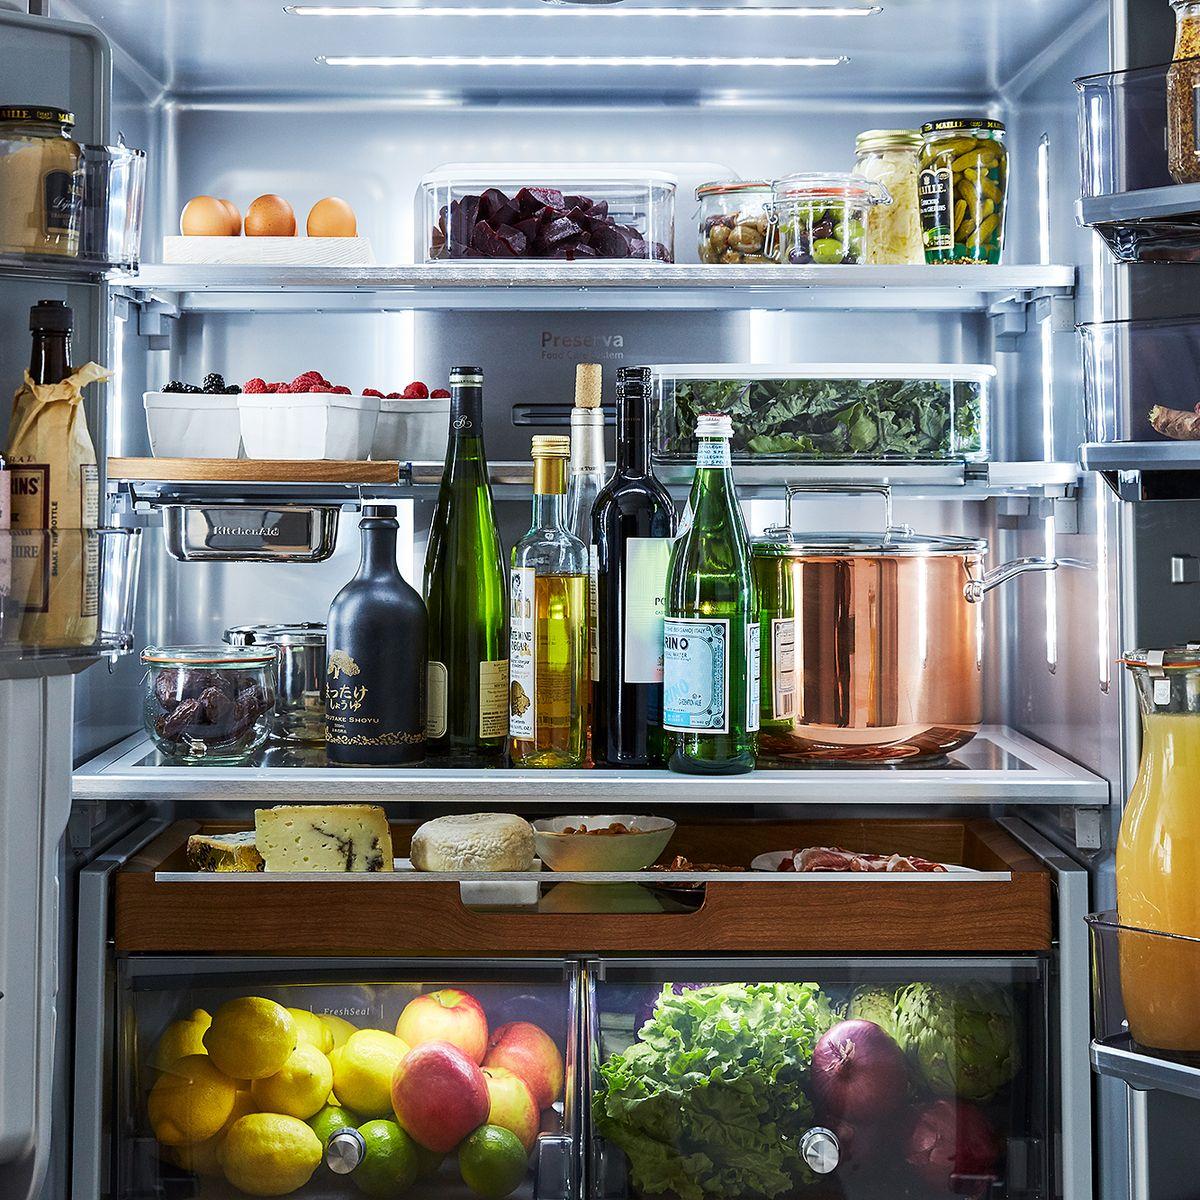 9 Refrigerator Organizing Hacks Ideas For A Cleaner Fridge